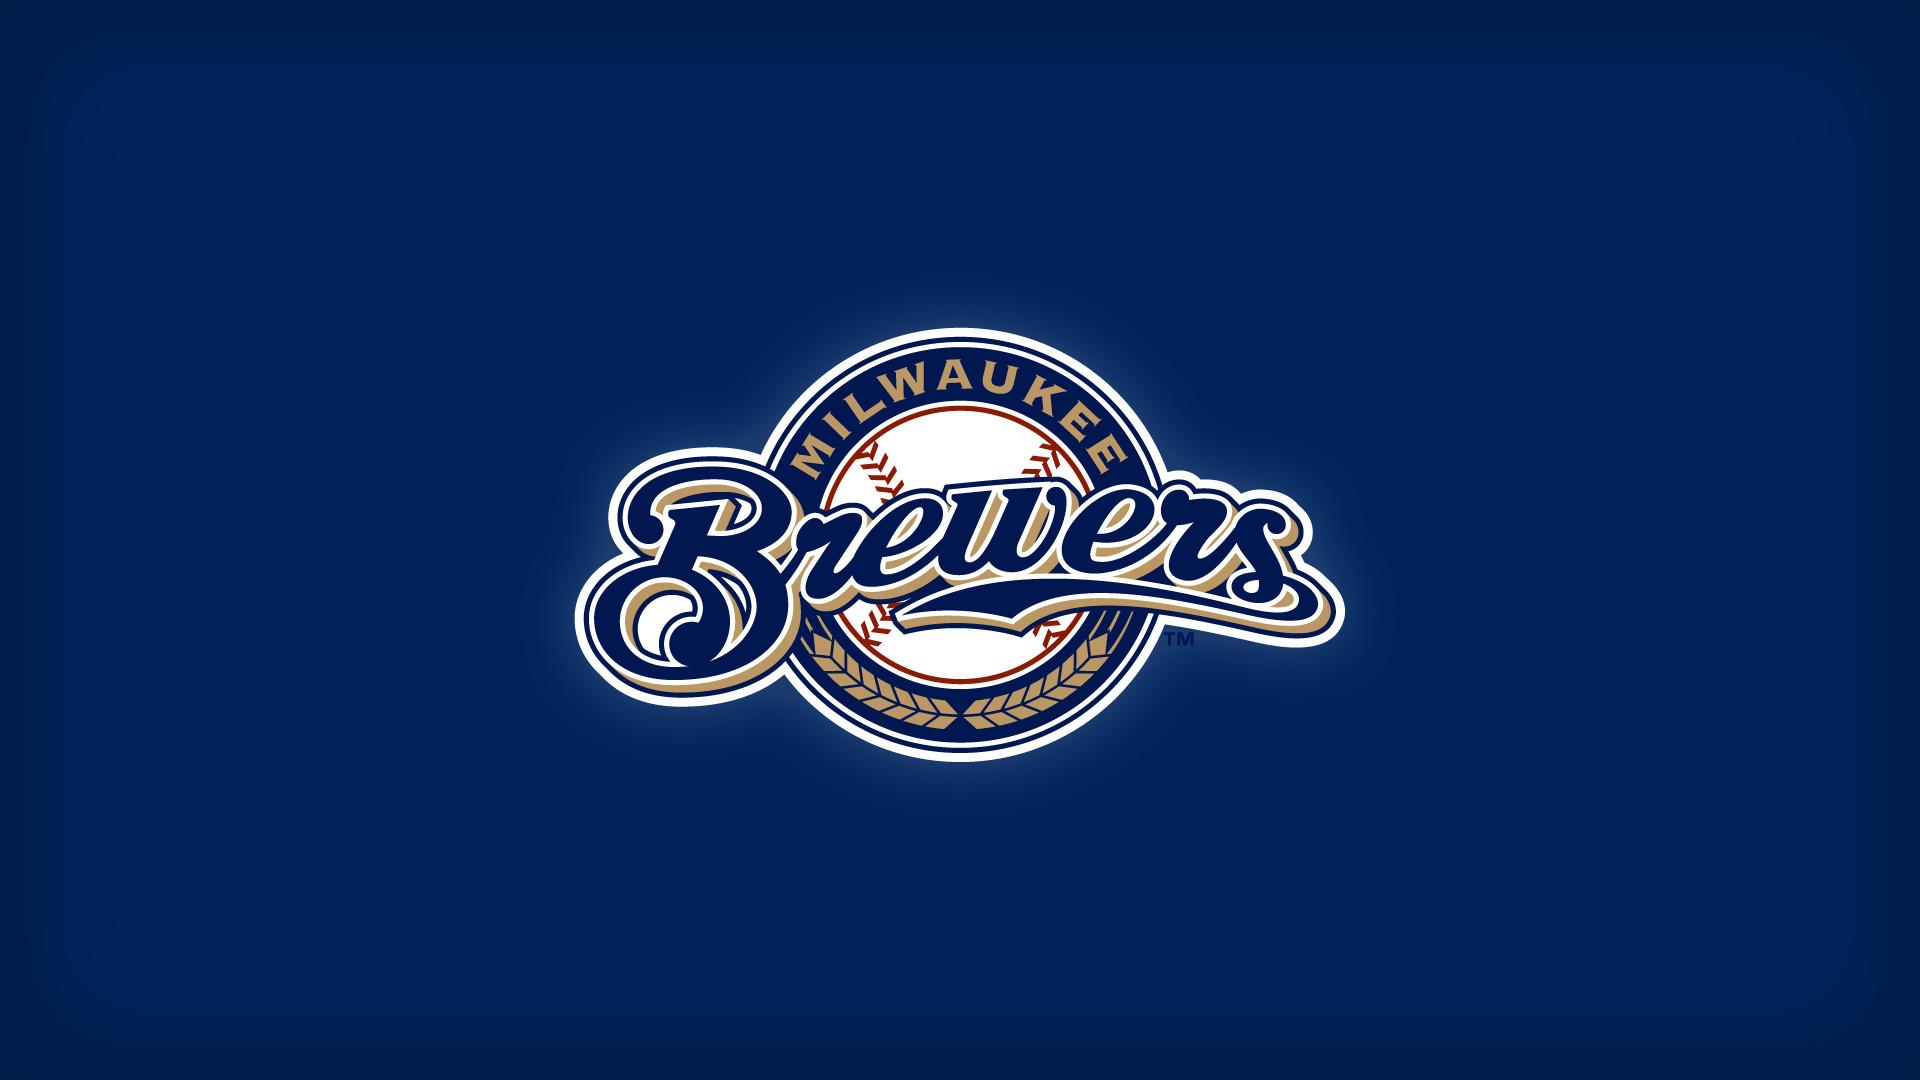 New England Patriots Iphone X Wallpaper Ny Yankees Logo Wallpaper 60 Images